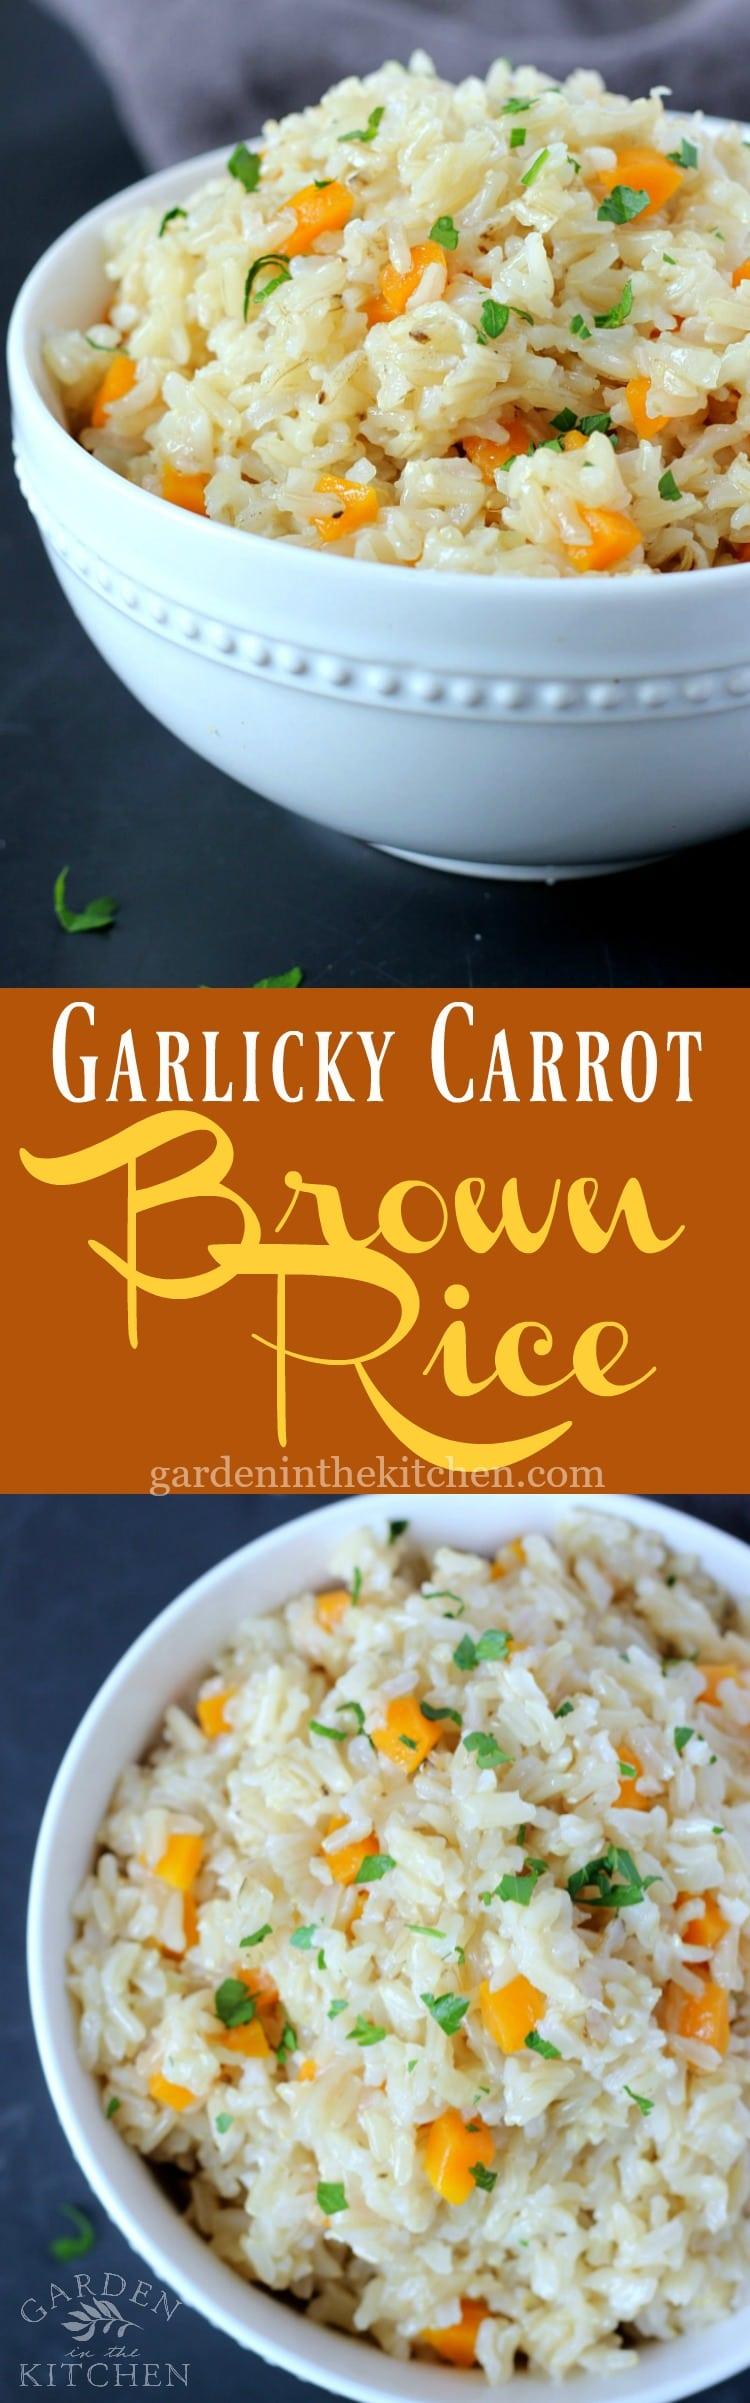 Garlicky Carrot Brown Rice